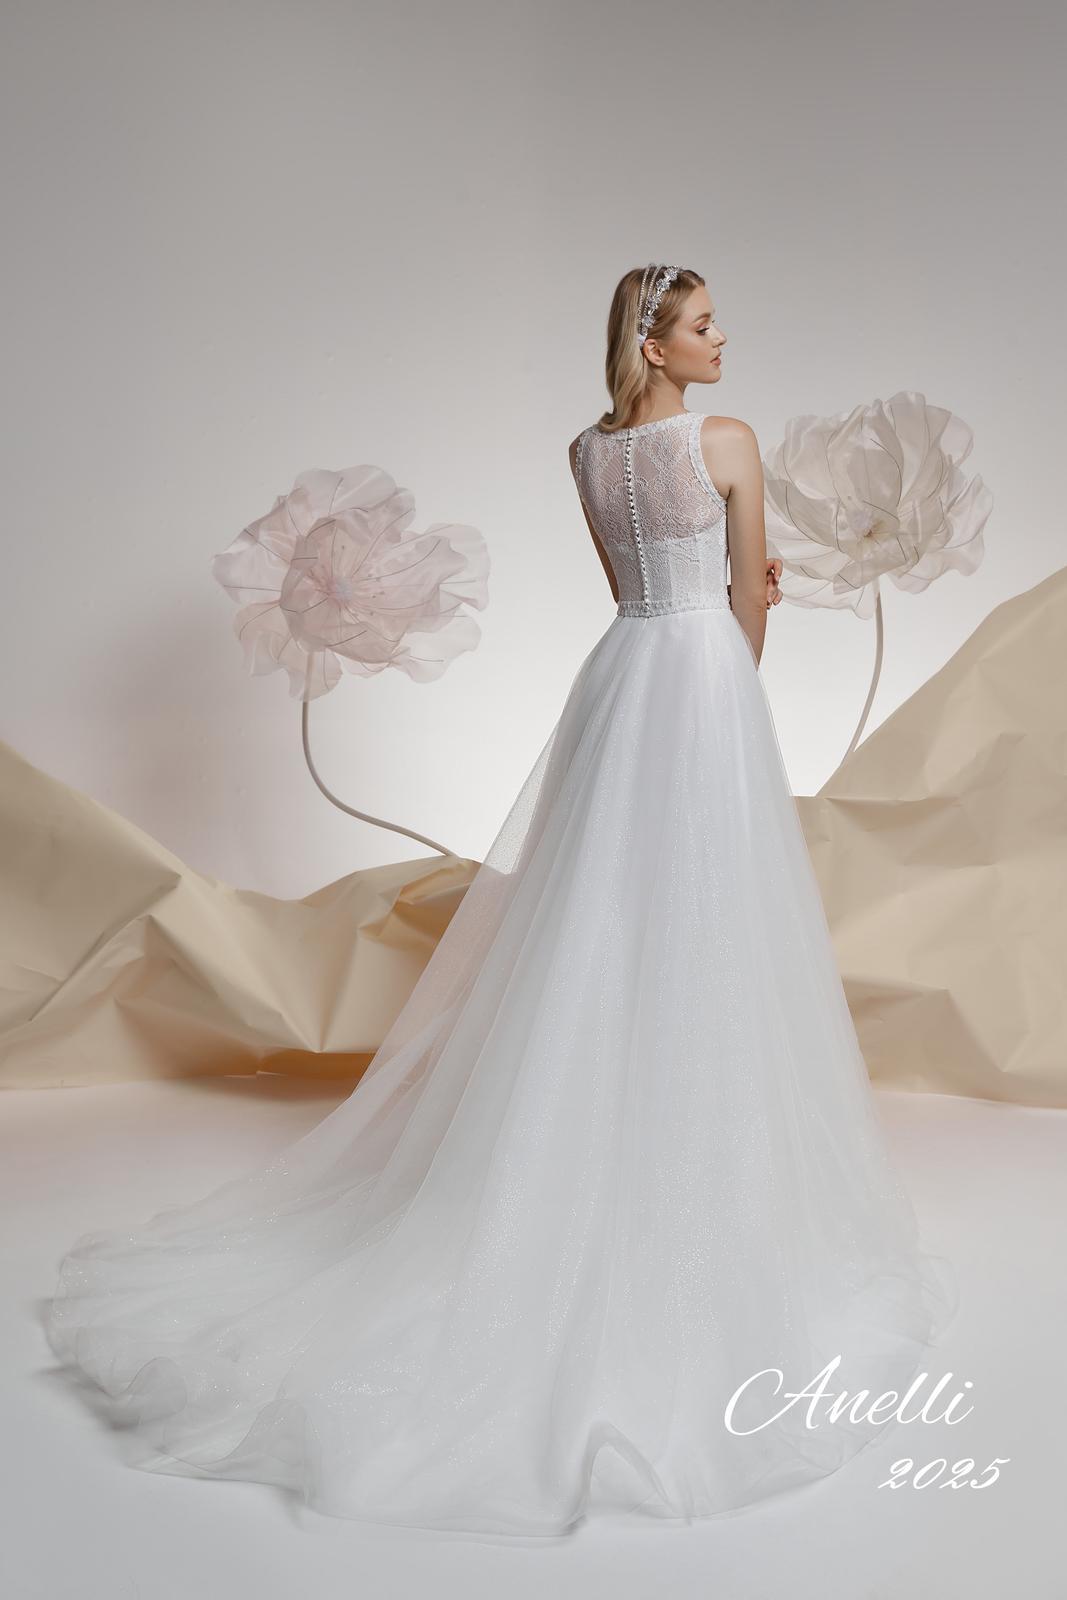 Svadobné šaty - Imagine 2025 - Obrázok č. 3